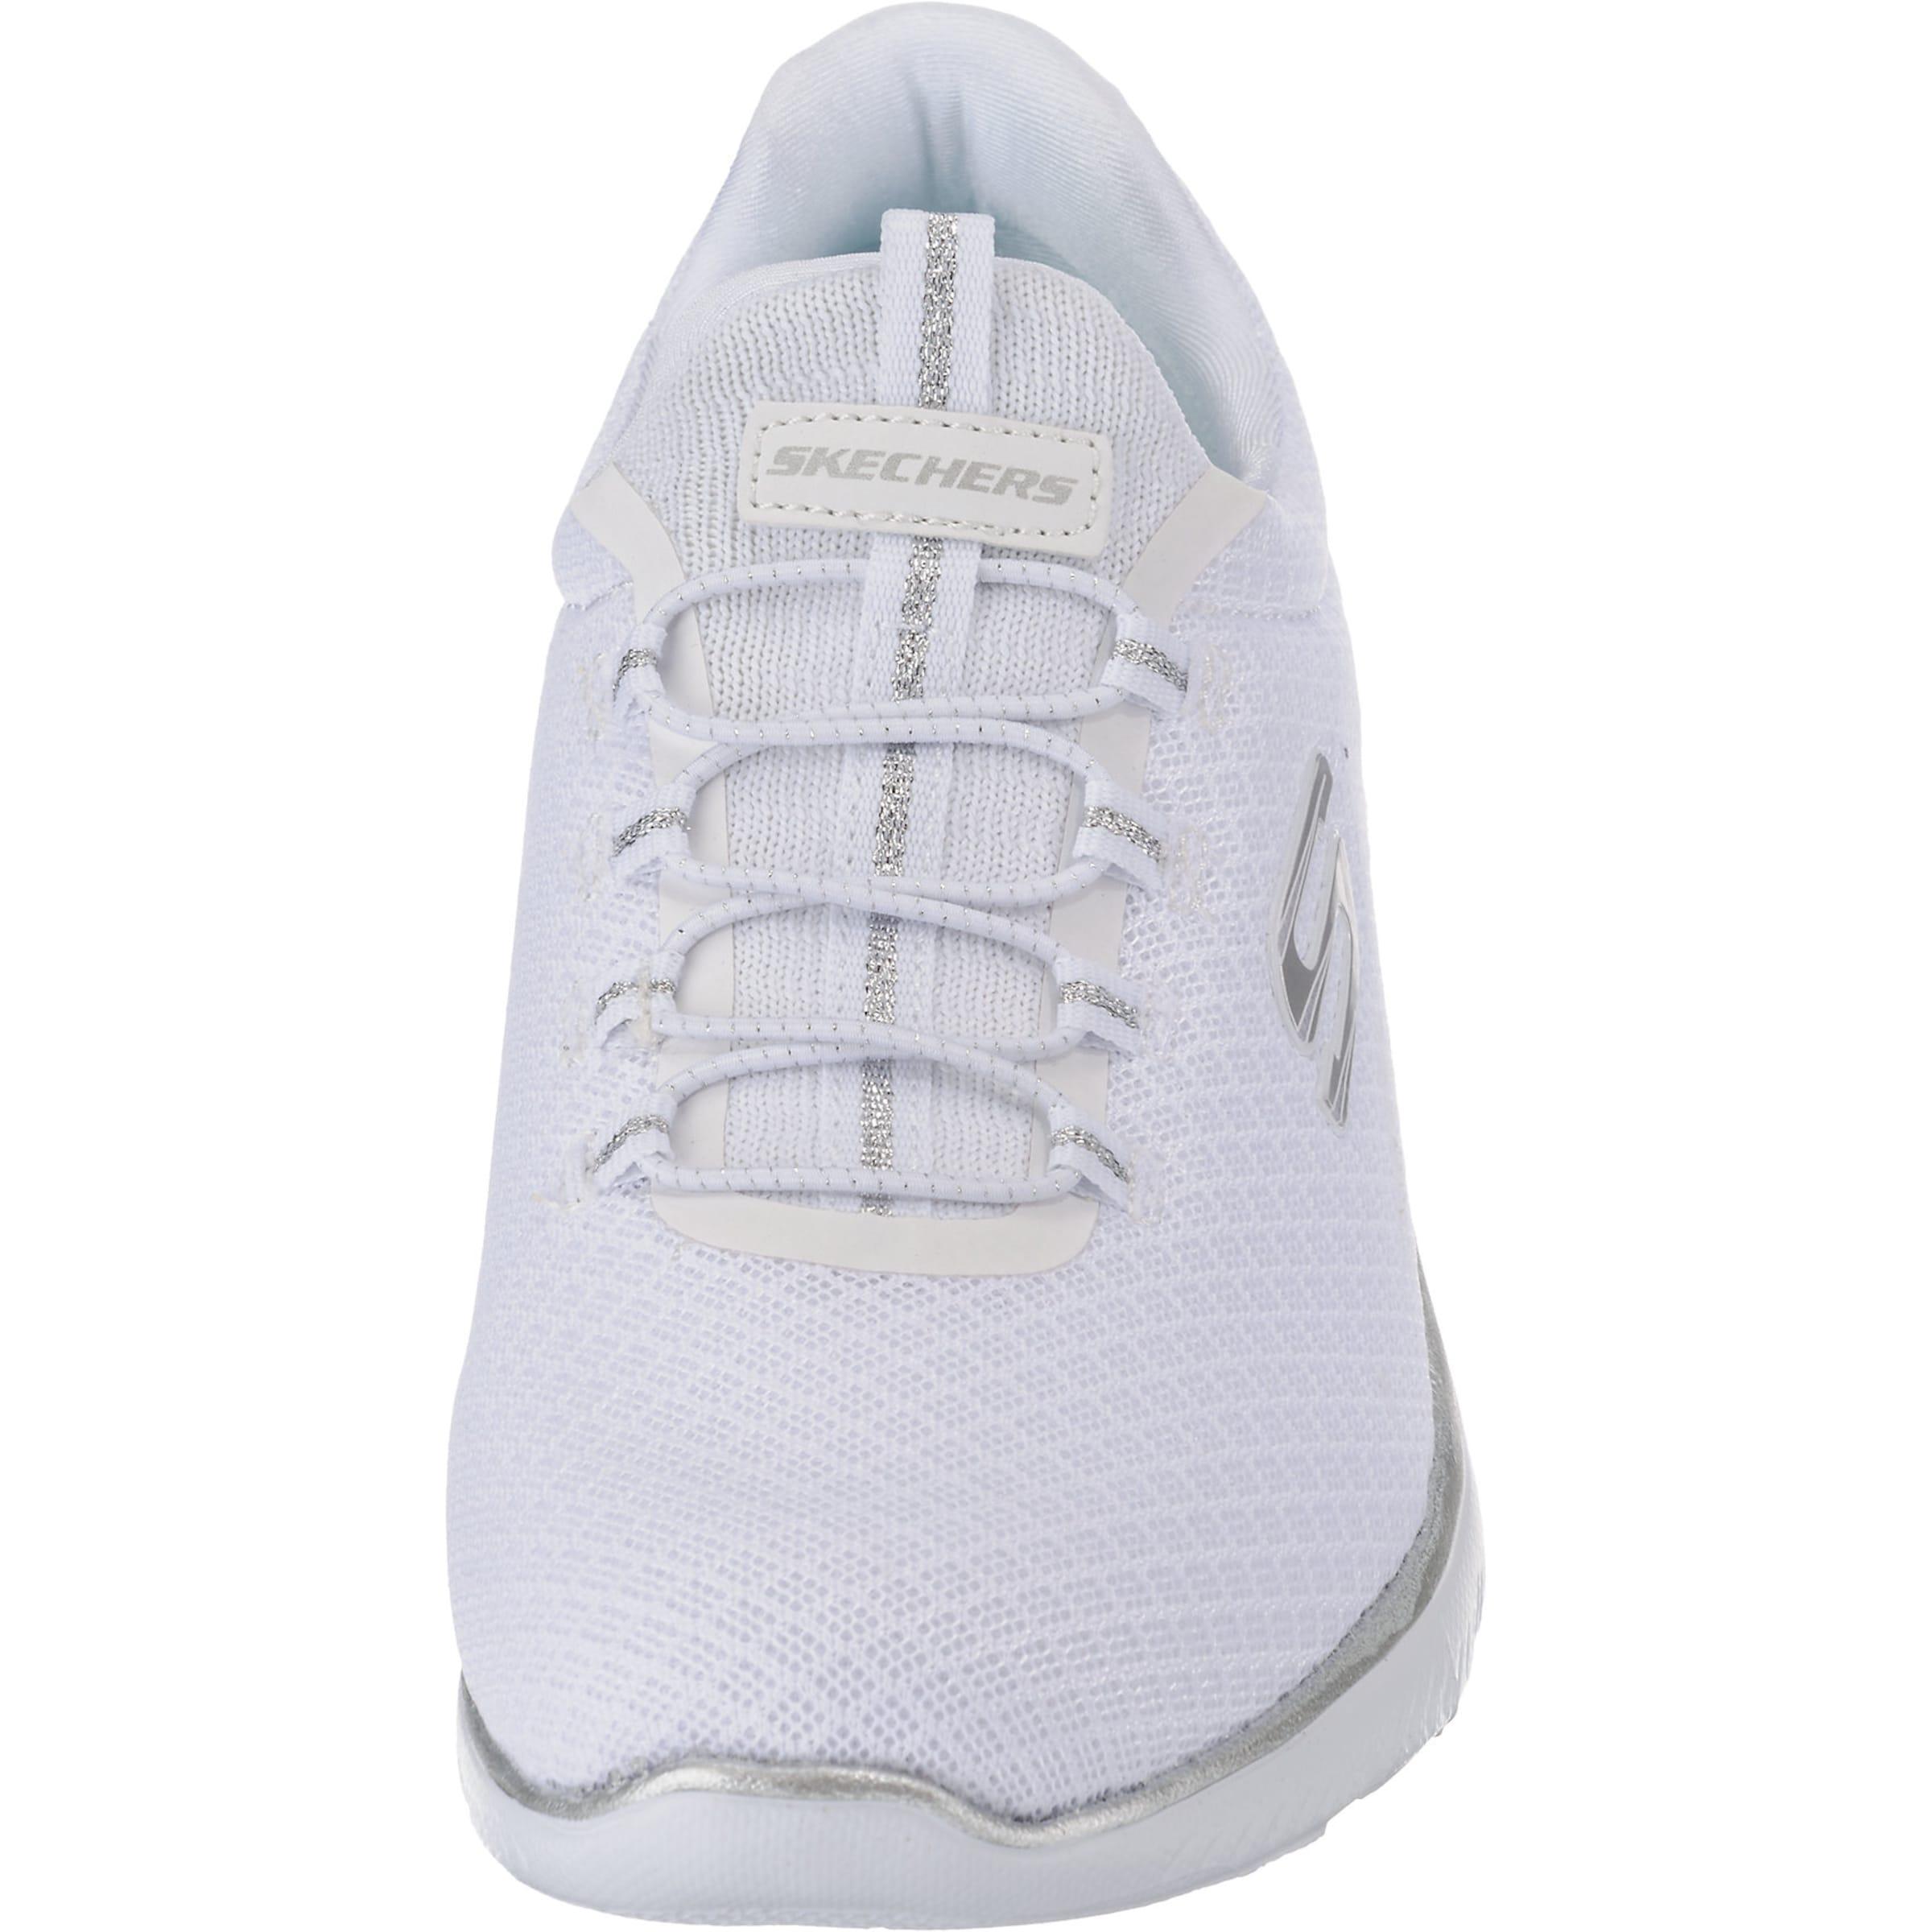 Skechers Skechers In Sneaker Sneaker In 'summits' In Weiß Sneaker Weiß Skechers 'summits' 'summits' 45jA3RL